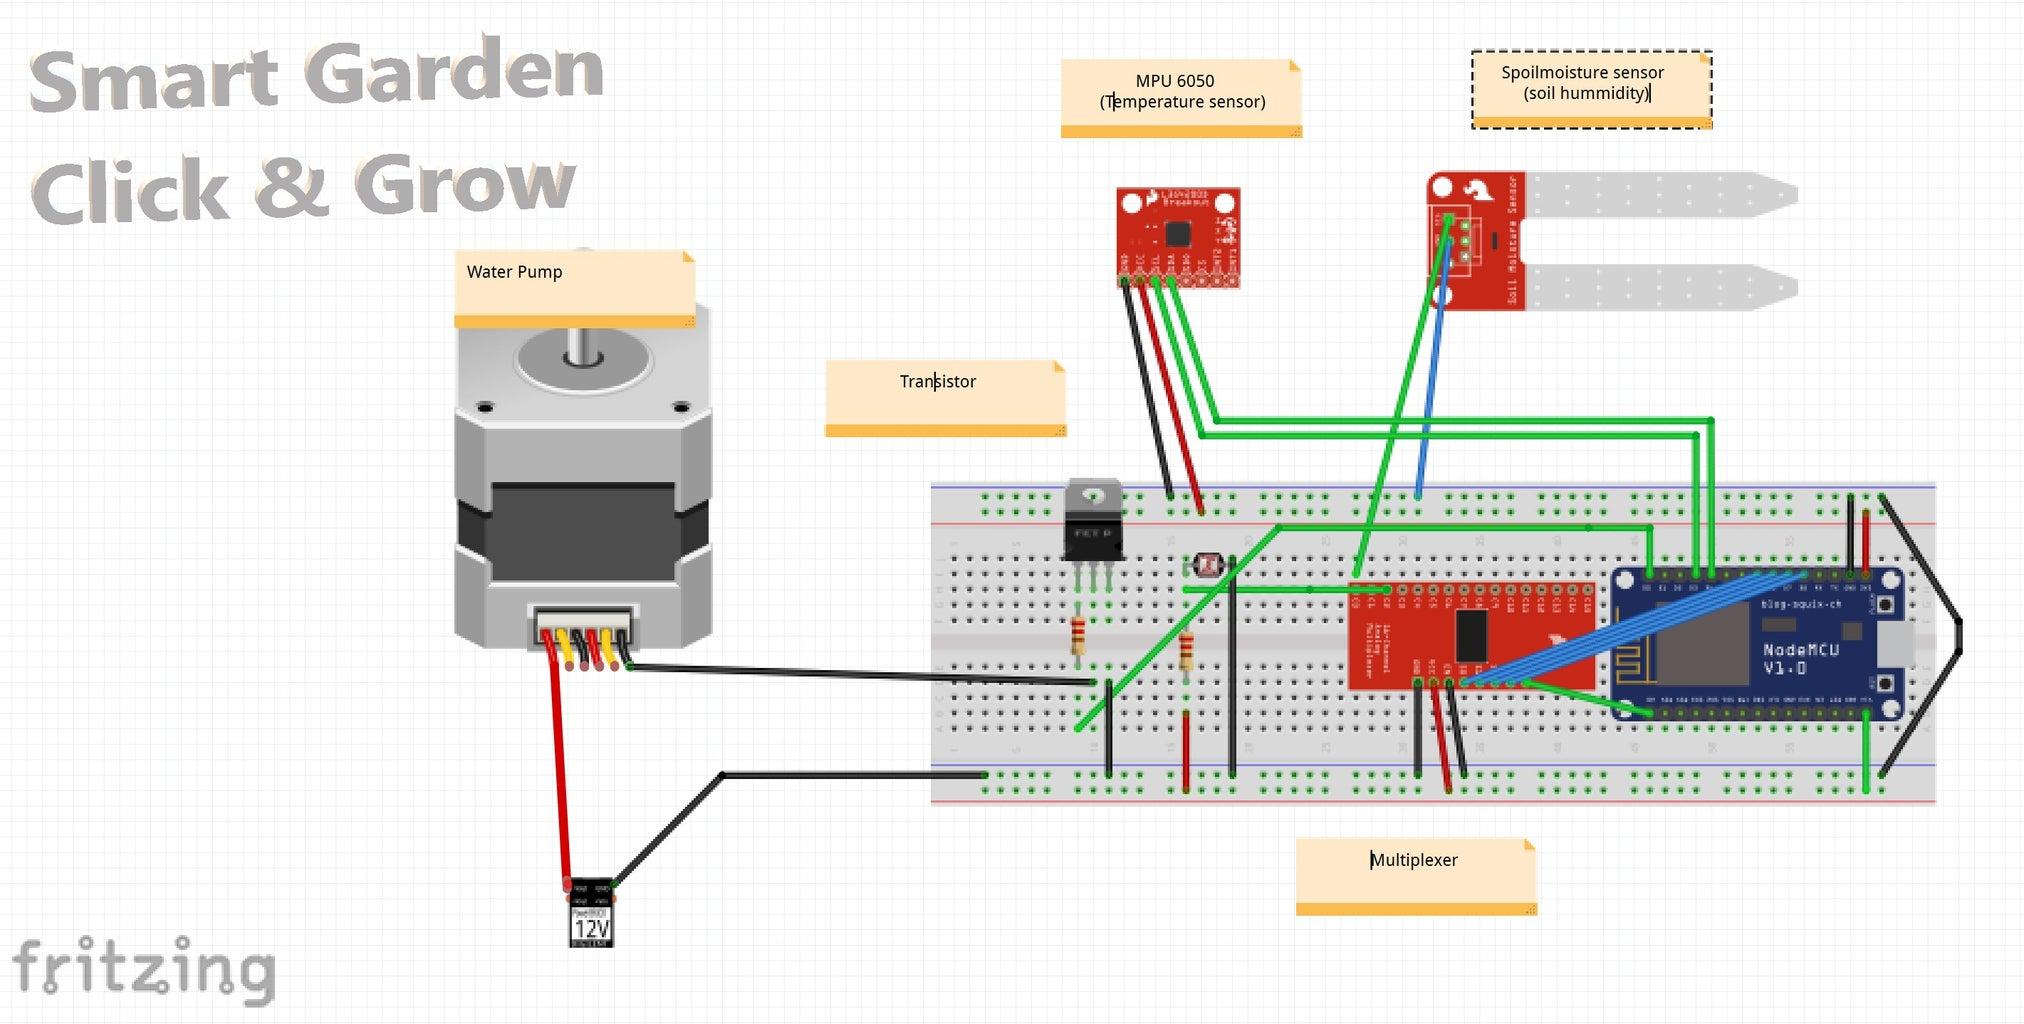 Wiring - Board and Sensors